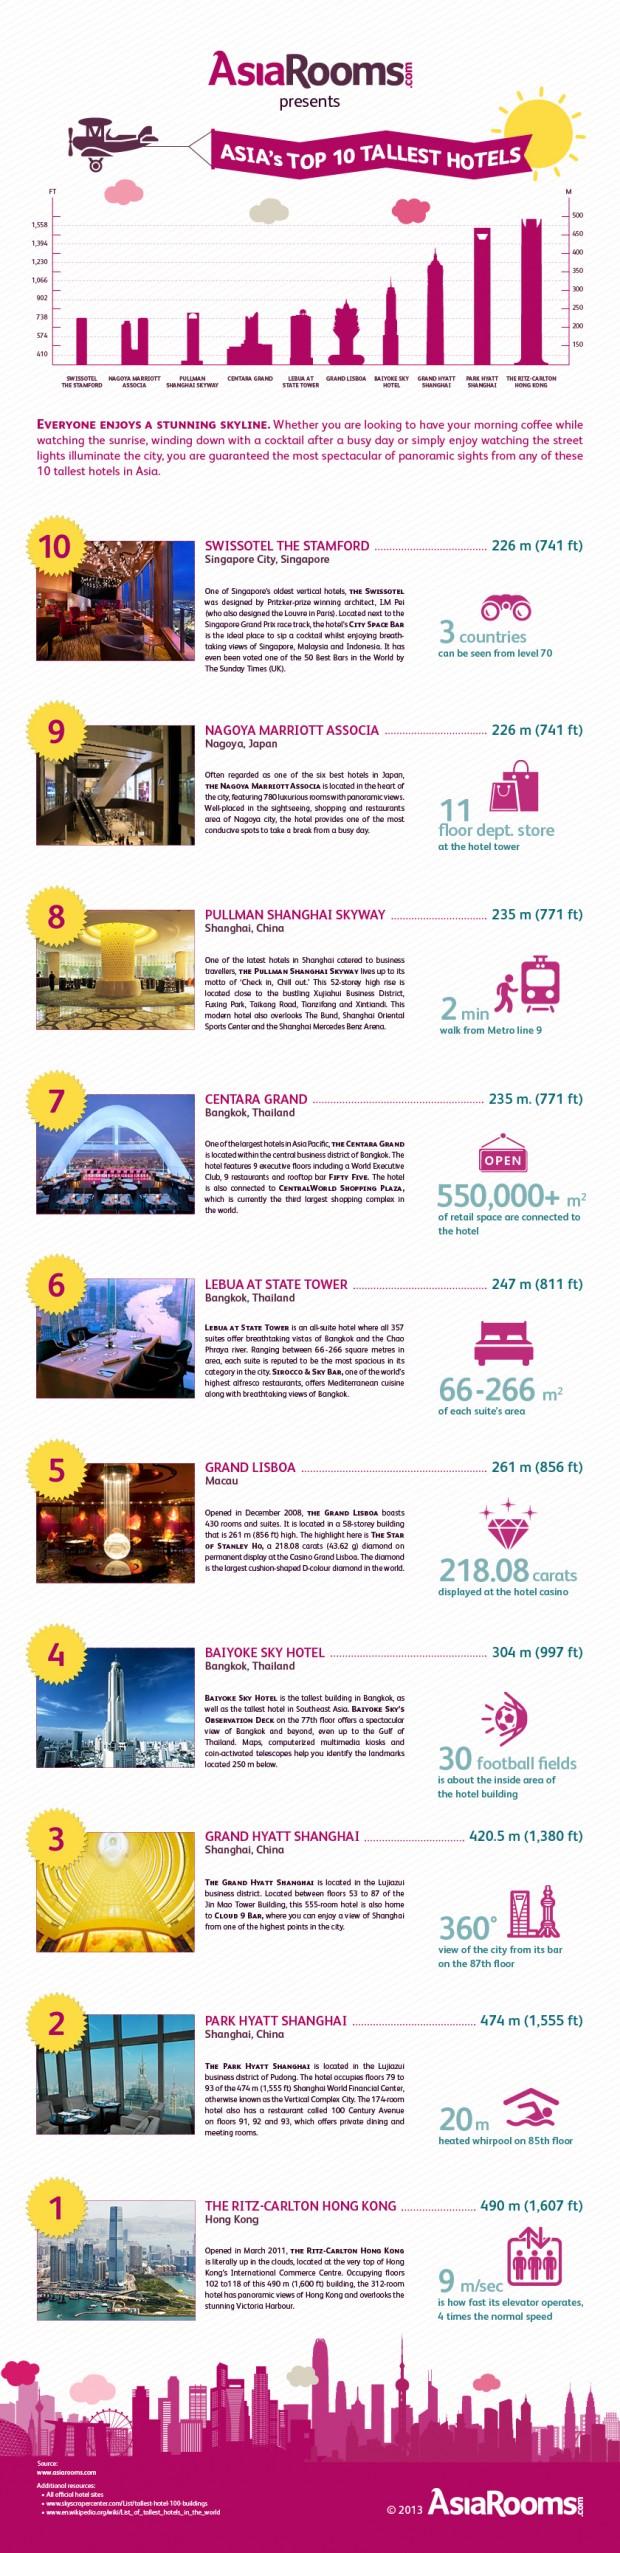 AspirantSG - Asia's 10 Tallest Hotels